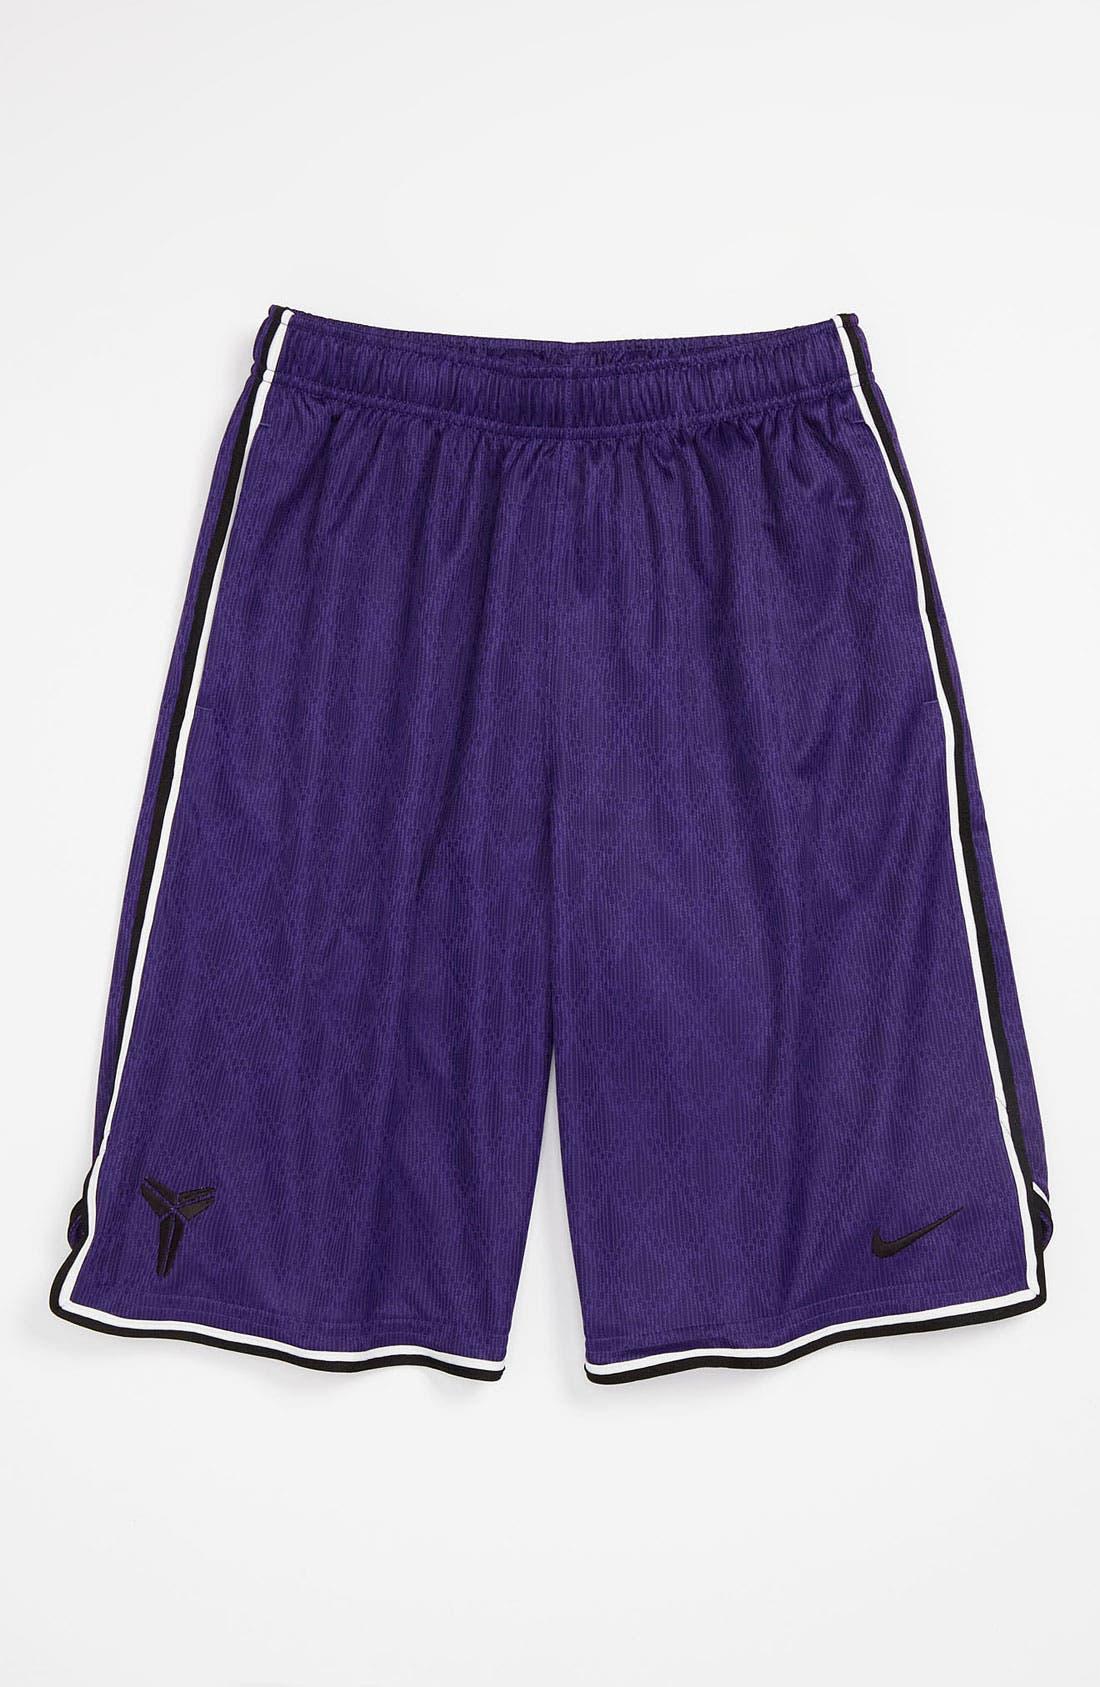 Alternate Image 1 Selected - Nike 'Kobe Essential' Shorts (Big Boys)